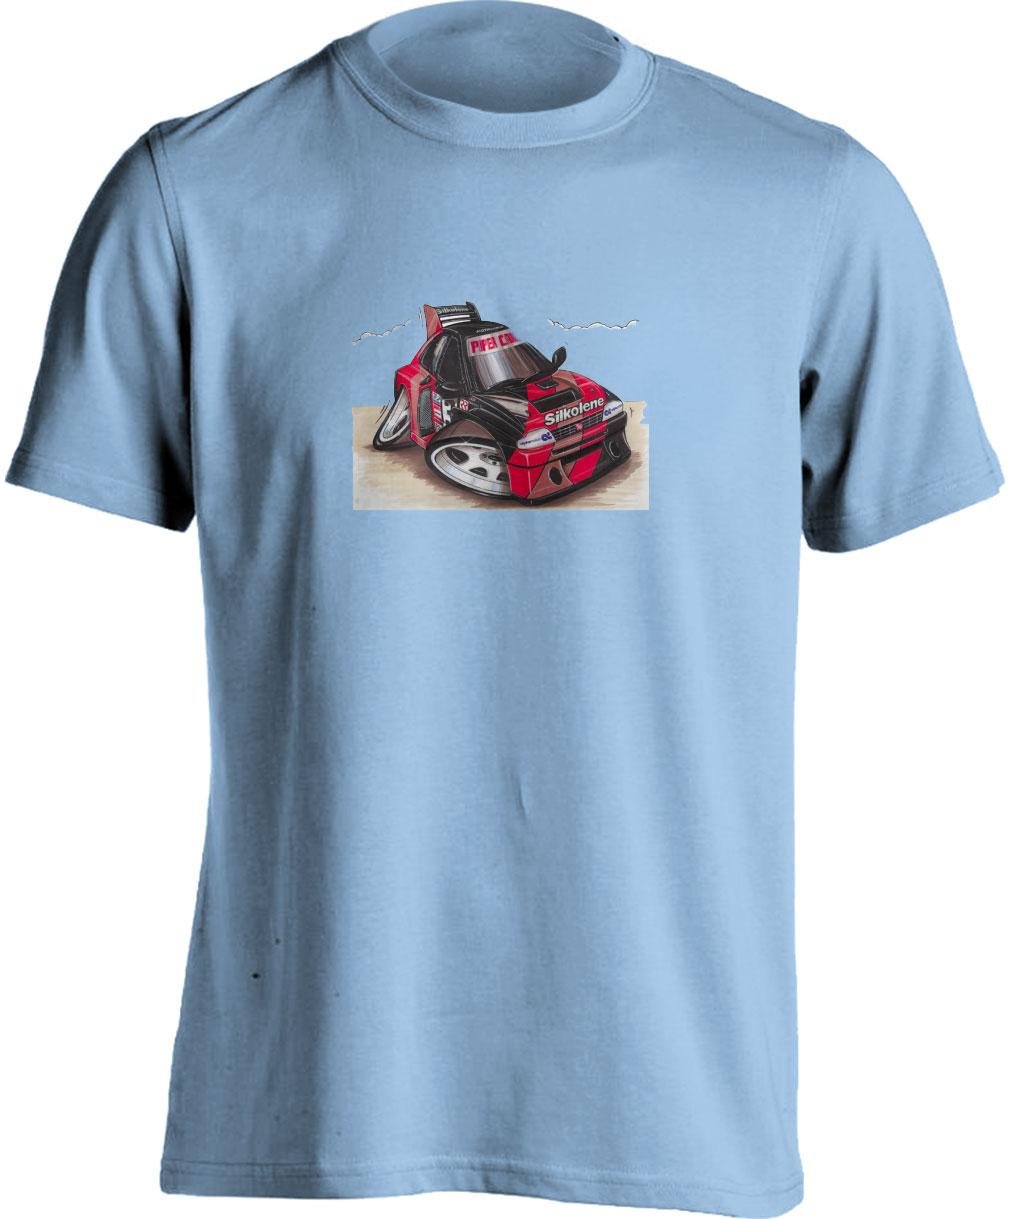 Koolart Austin Rover MG Metro 6R4 Silkolene Livery-0505-Child's T Shirt